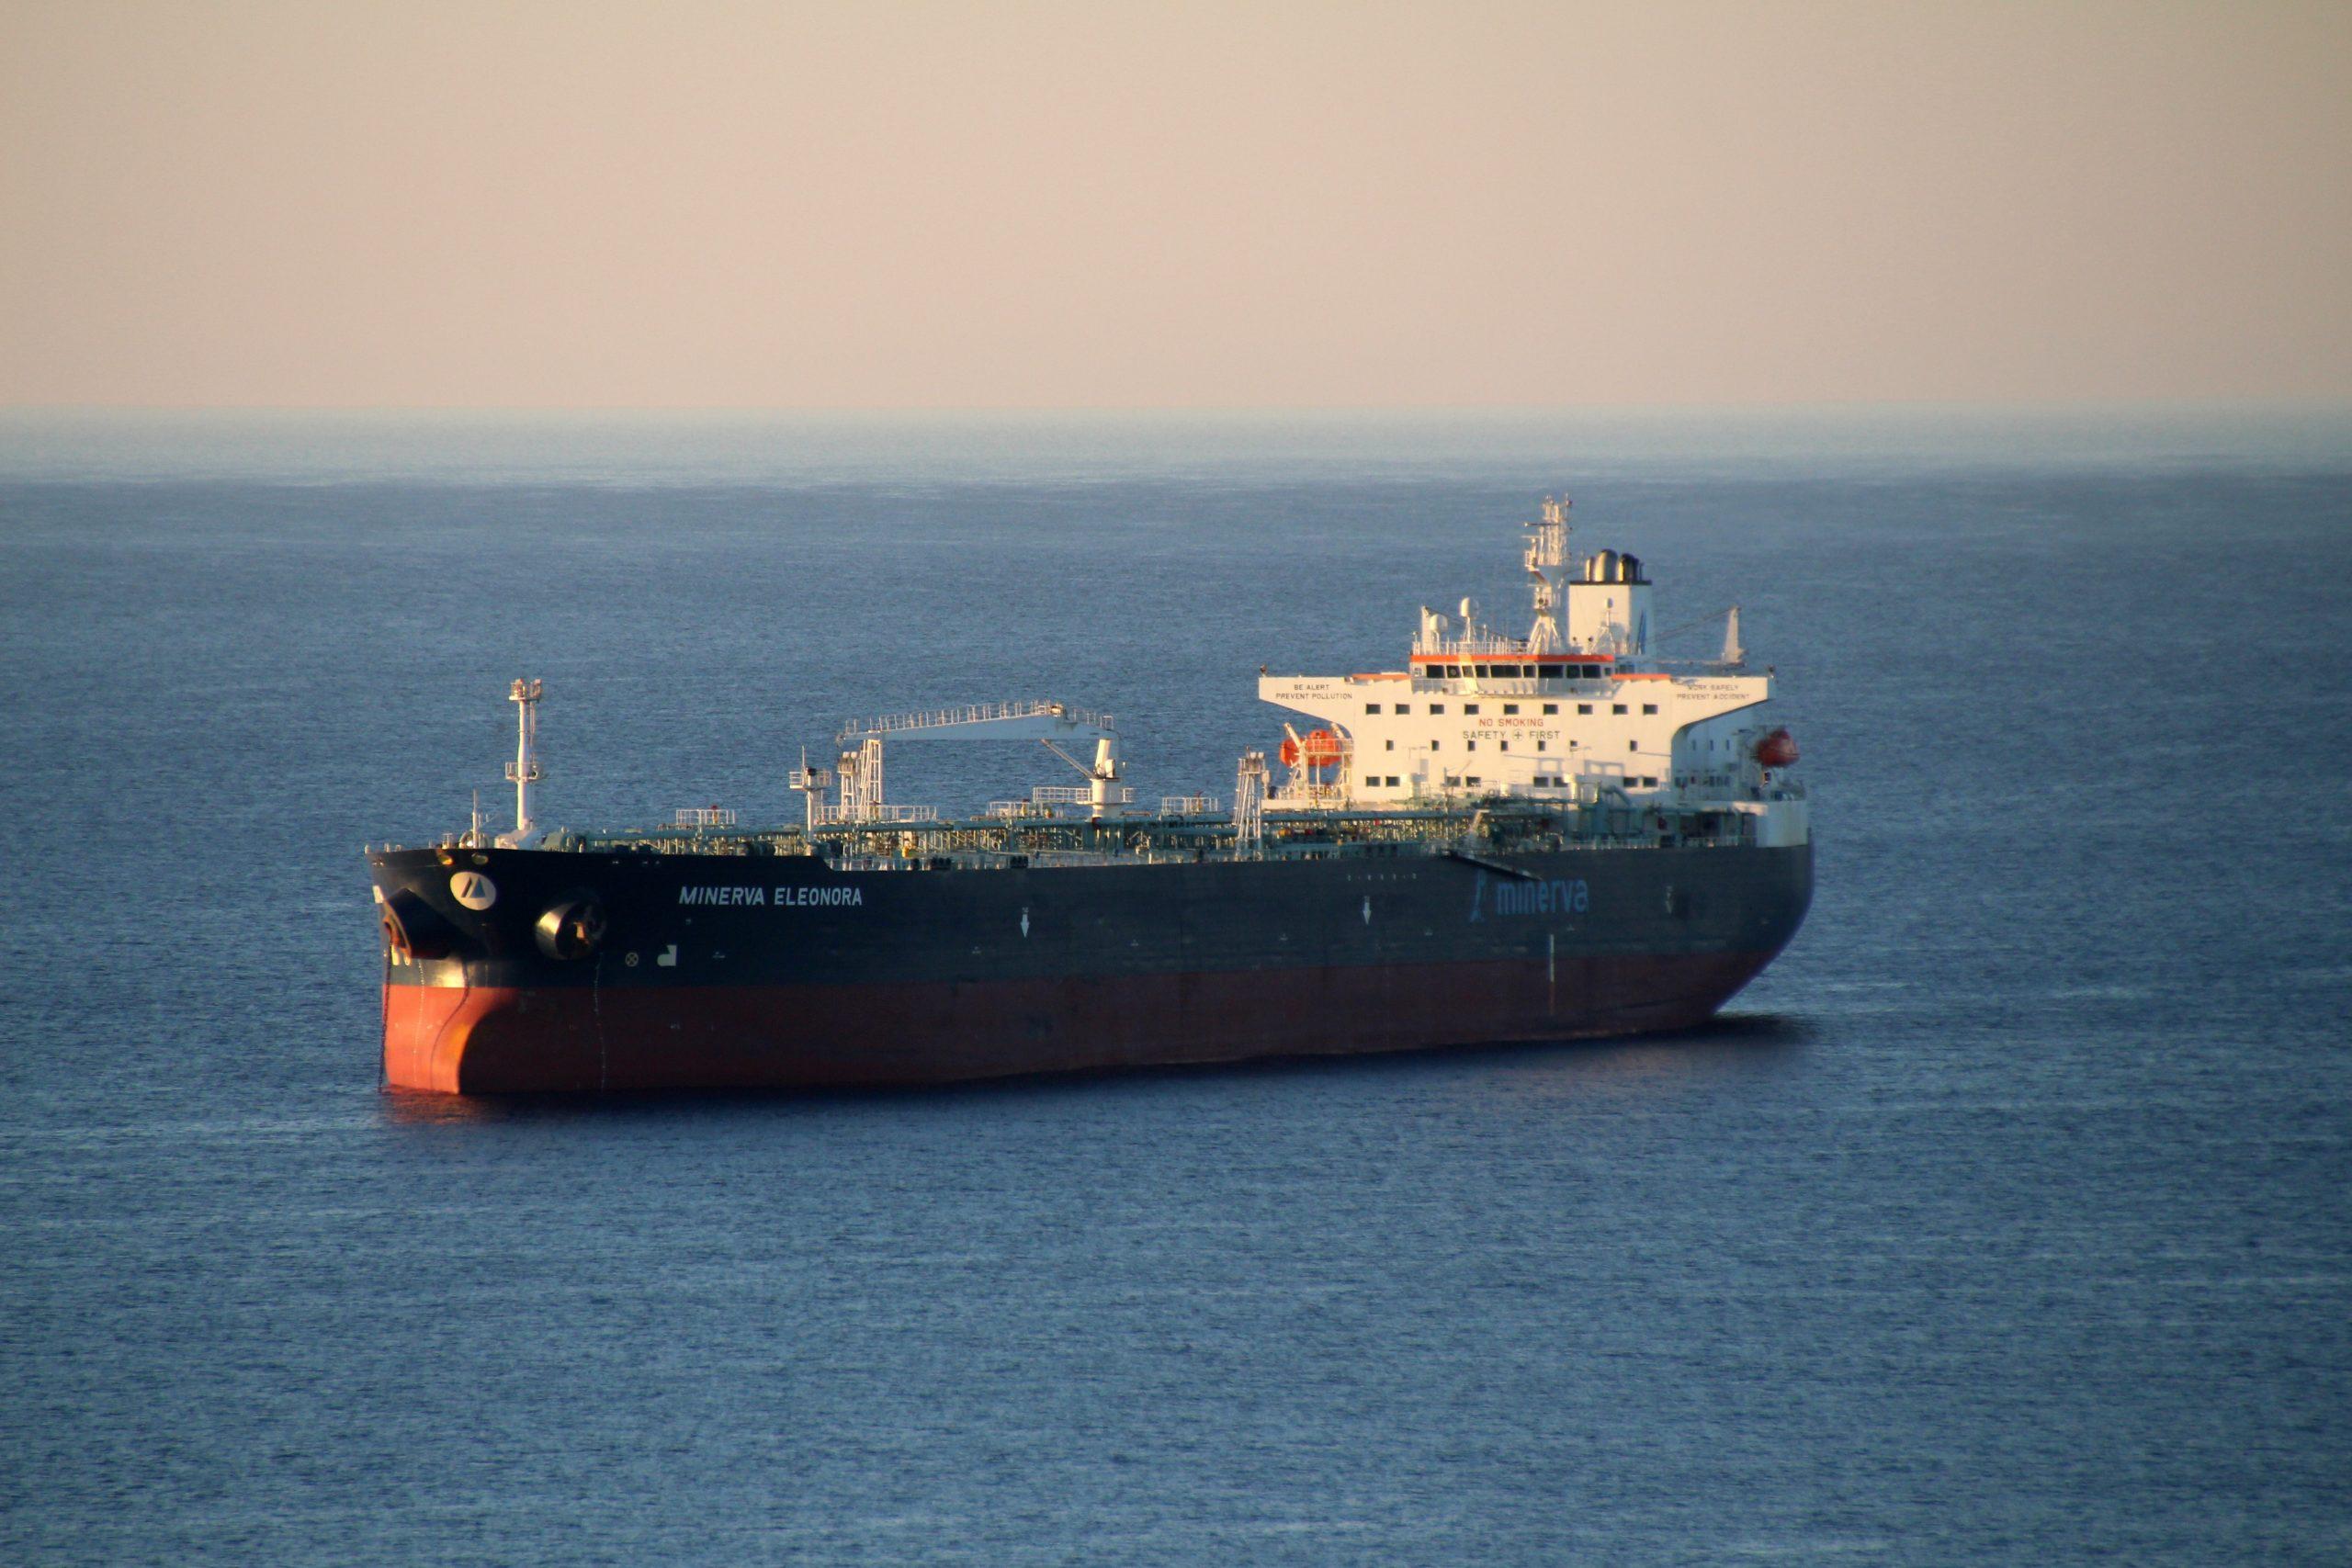 Despite U.S. sanctions, Iran and Venezuela strike oil export deal